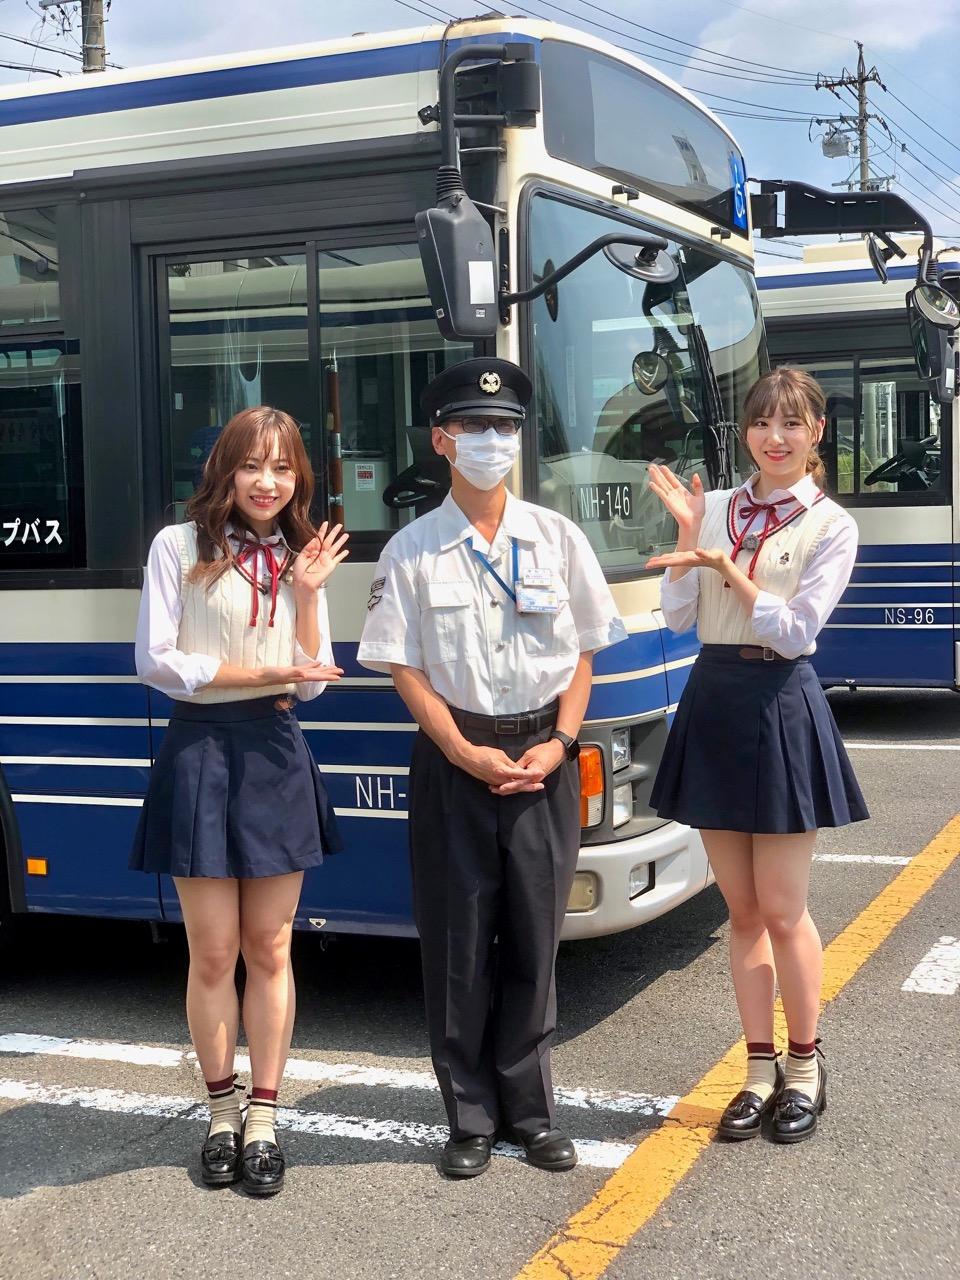 「SKE48とちょっとそこまで」菅原茉椰&日高優月が市バス運転士の男性と出会う②【2021.8.17 21:54〜 東海テレビ】